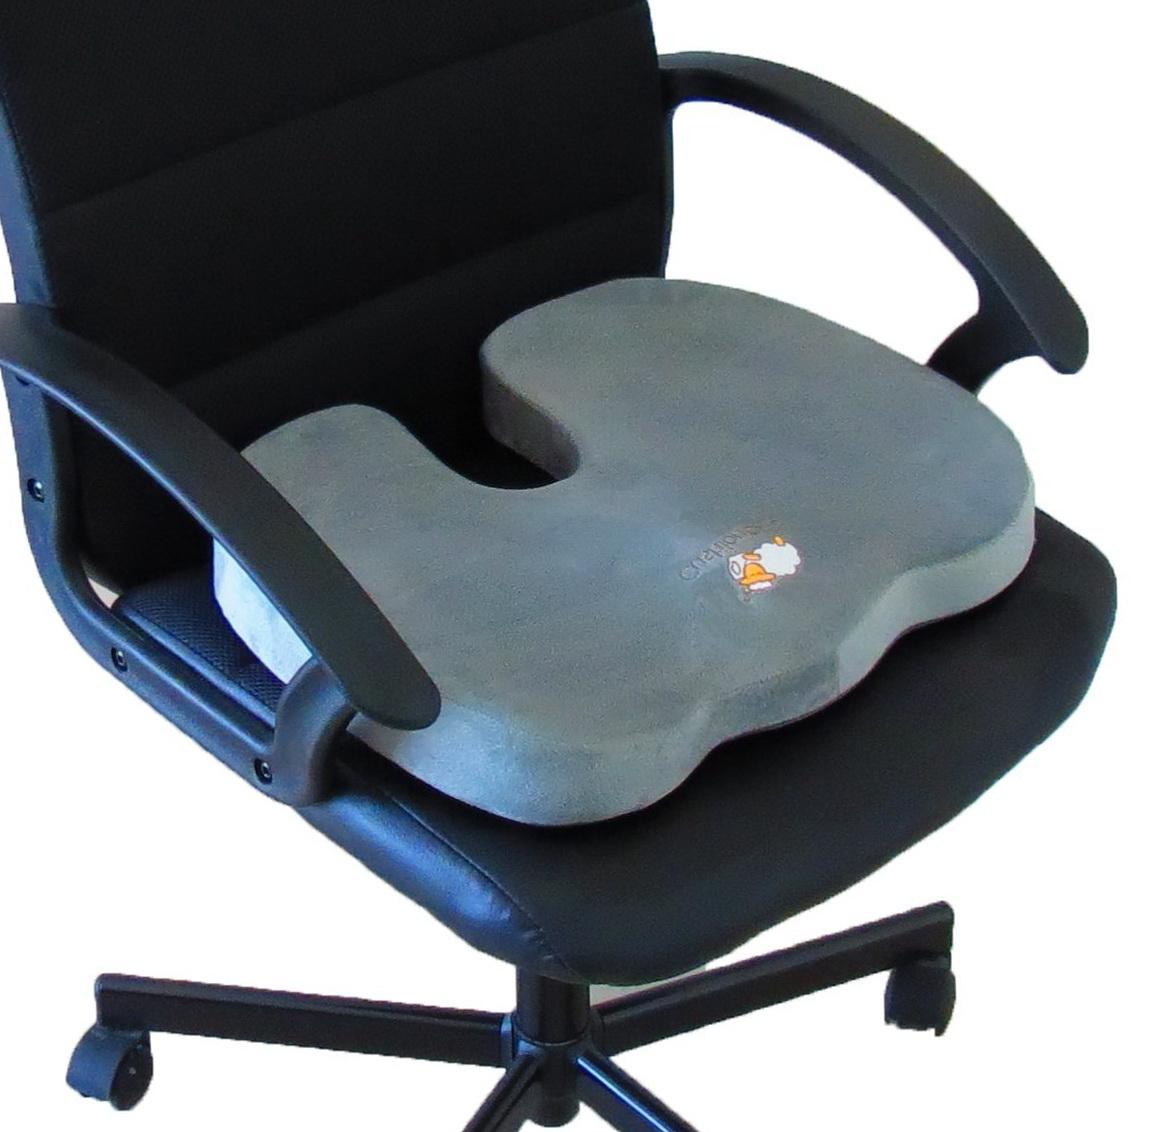 Orthopedic Seat Cushion For Cars